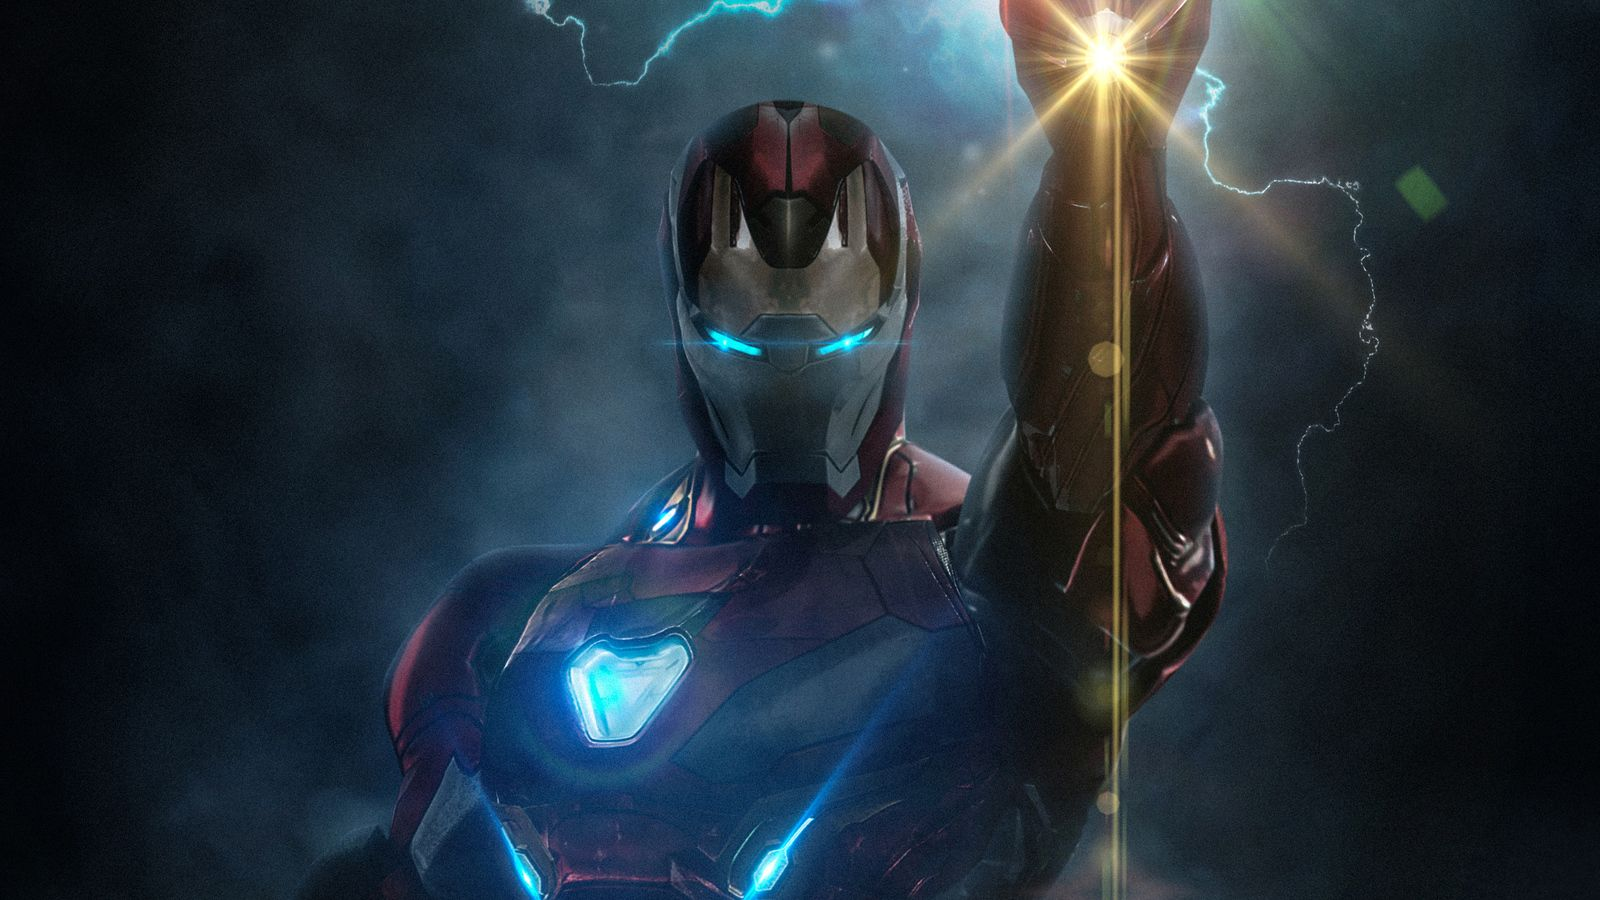 Infinity War Iron Man Wallpapers Top Free Infinity War